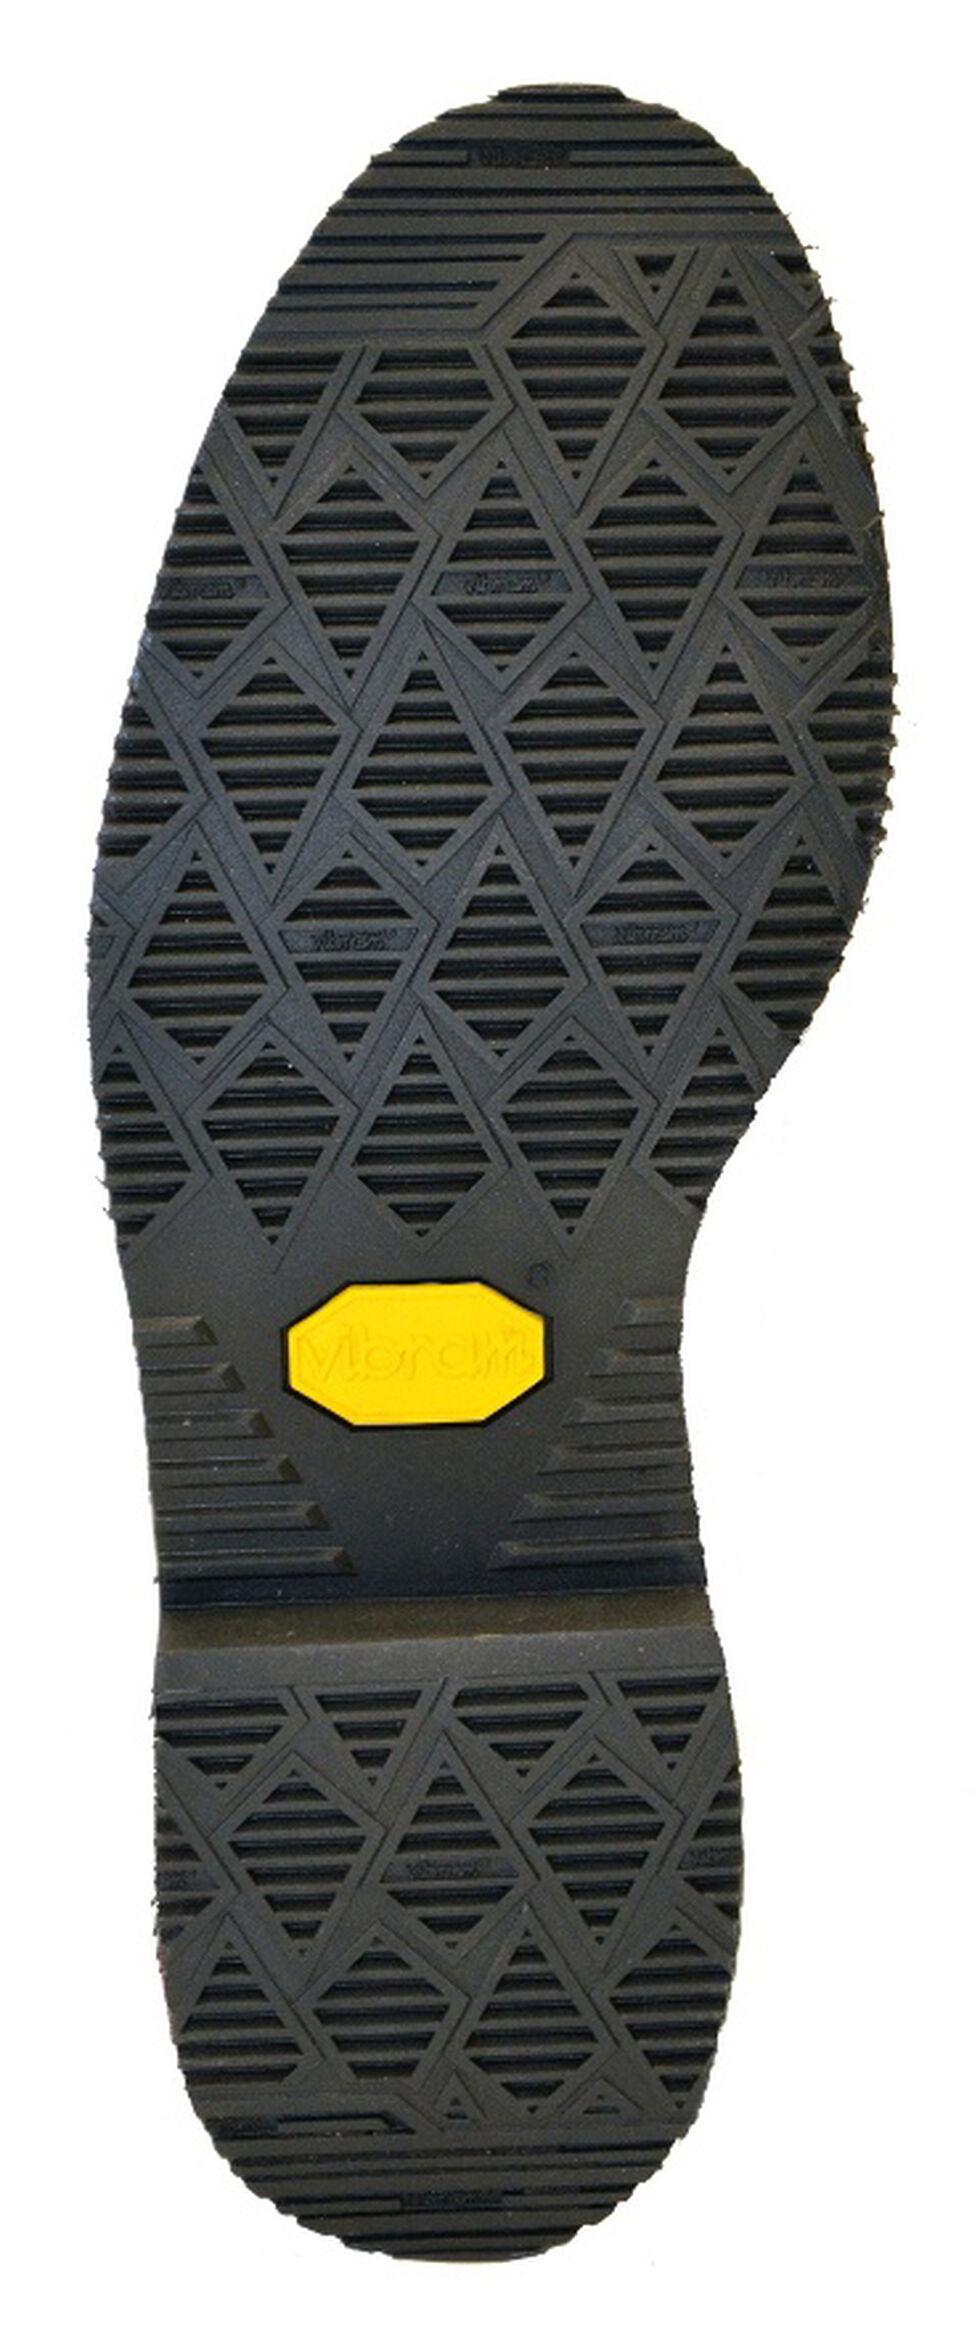 "Chippewa Men's Oiled Walnut 8"" Lace-Up Waterproof Work Boots - Steel Toe, Walnut, hi-res"